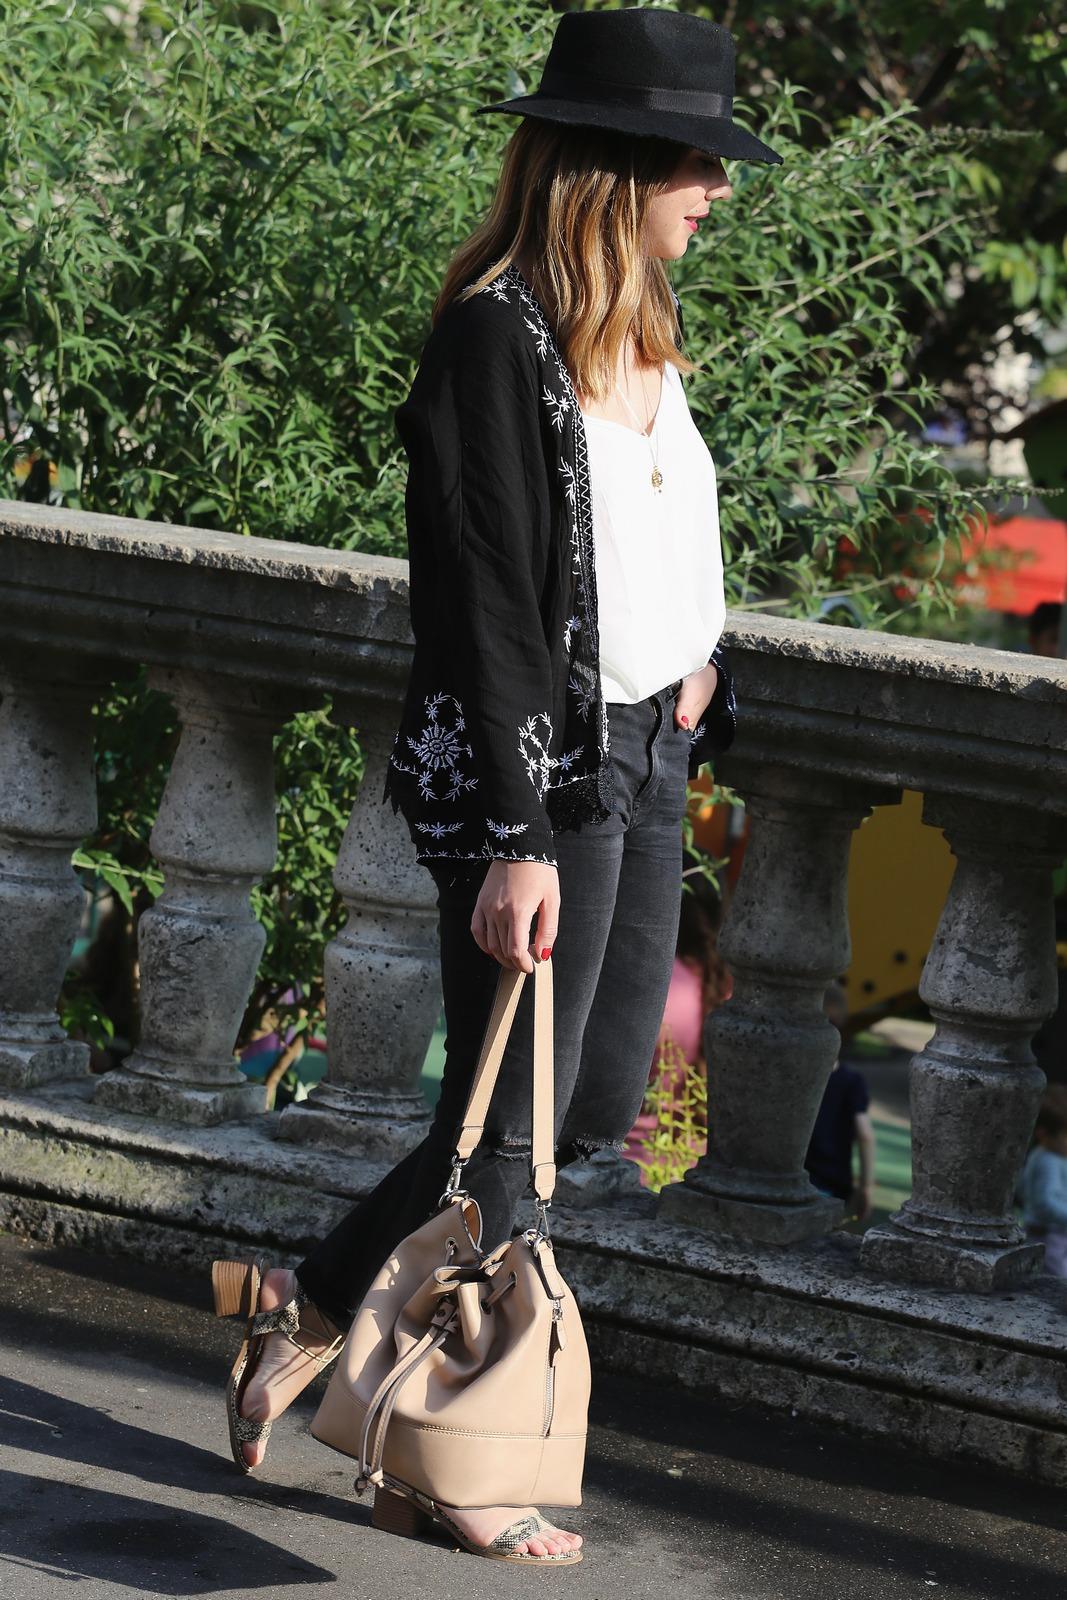 Blog mode femme Paris - Du style, Madame - streetstyle - boho